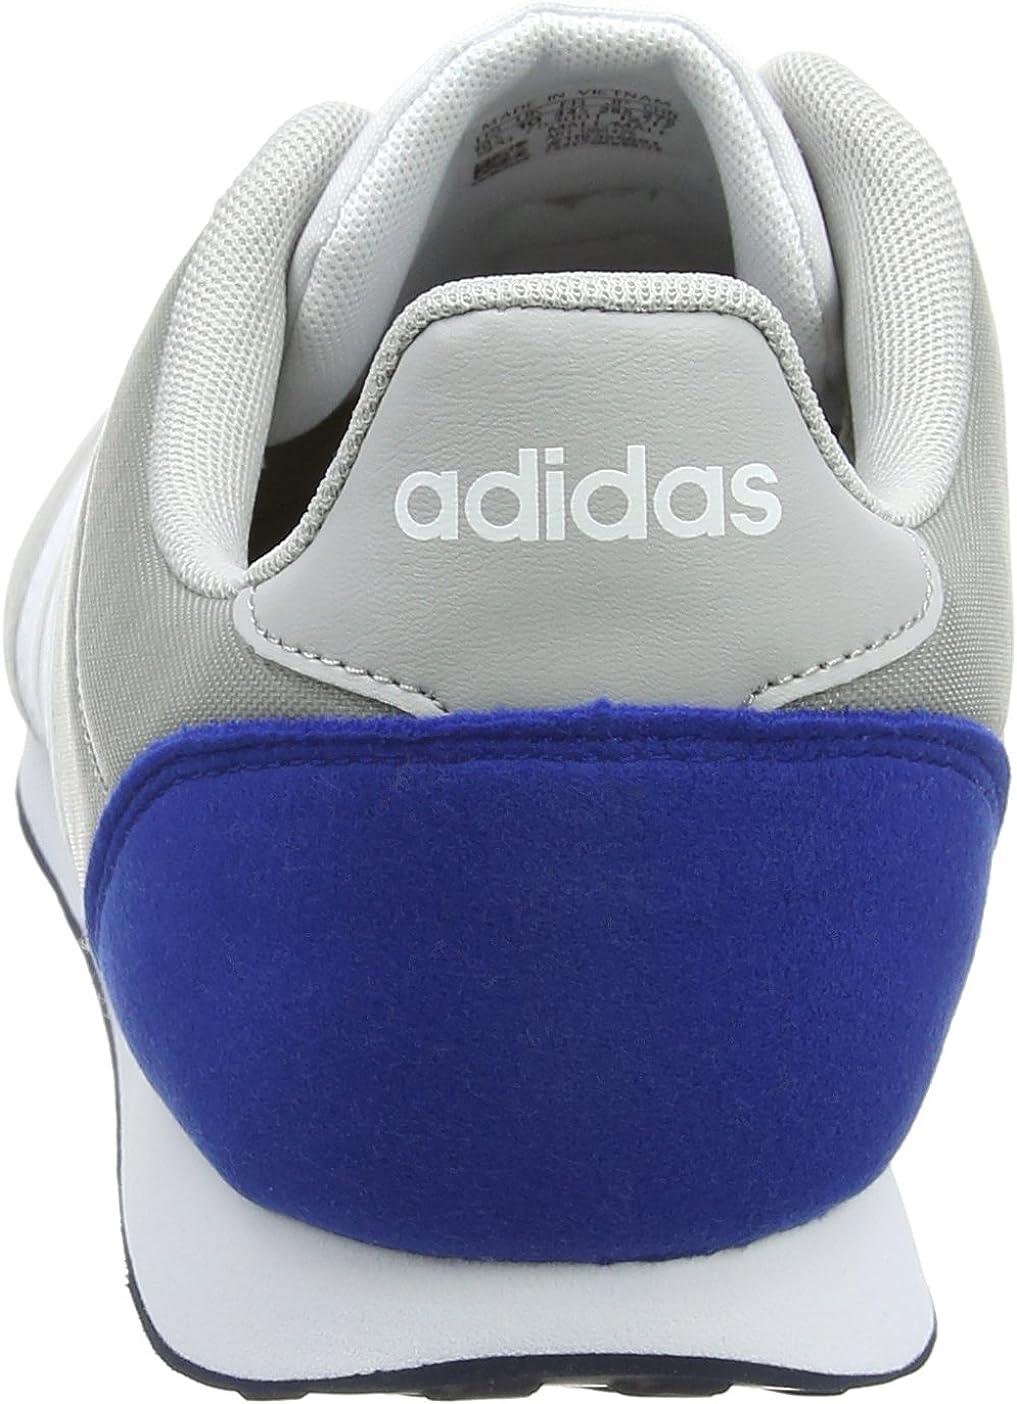 adidas V Racer 2.0, Chaussures de Running Homme: